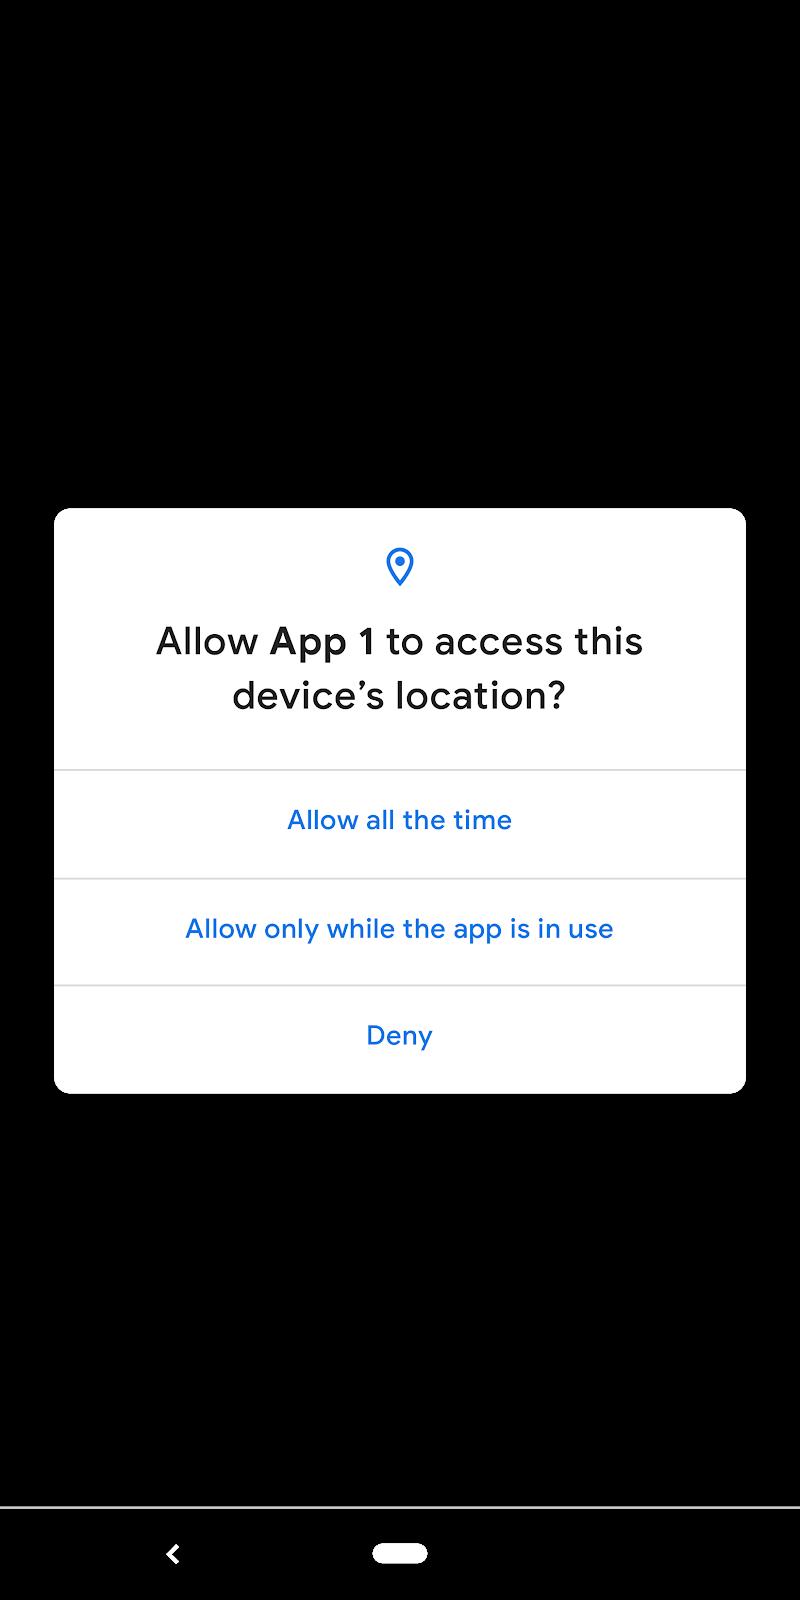 Android 10正式发布:具备先进AI能力,支持5G手机